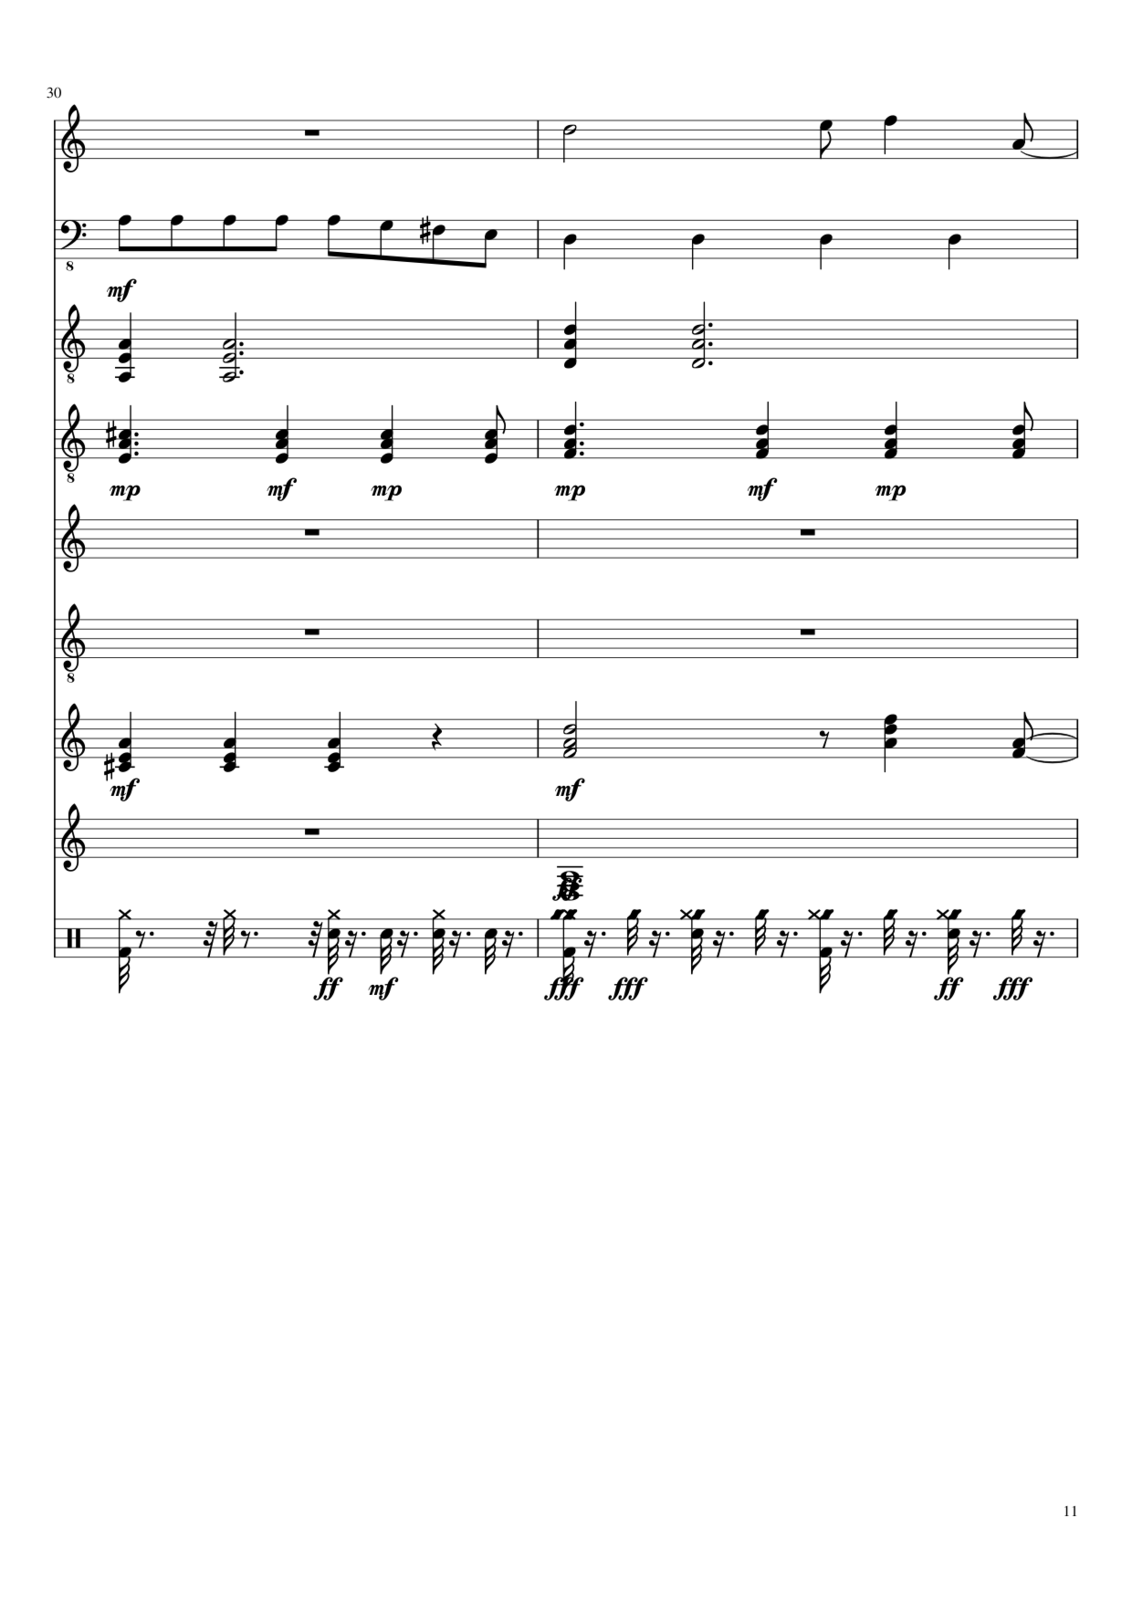 Mrs. Vandebilt slide, Image 11